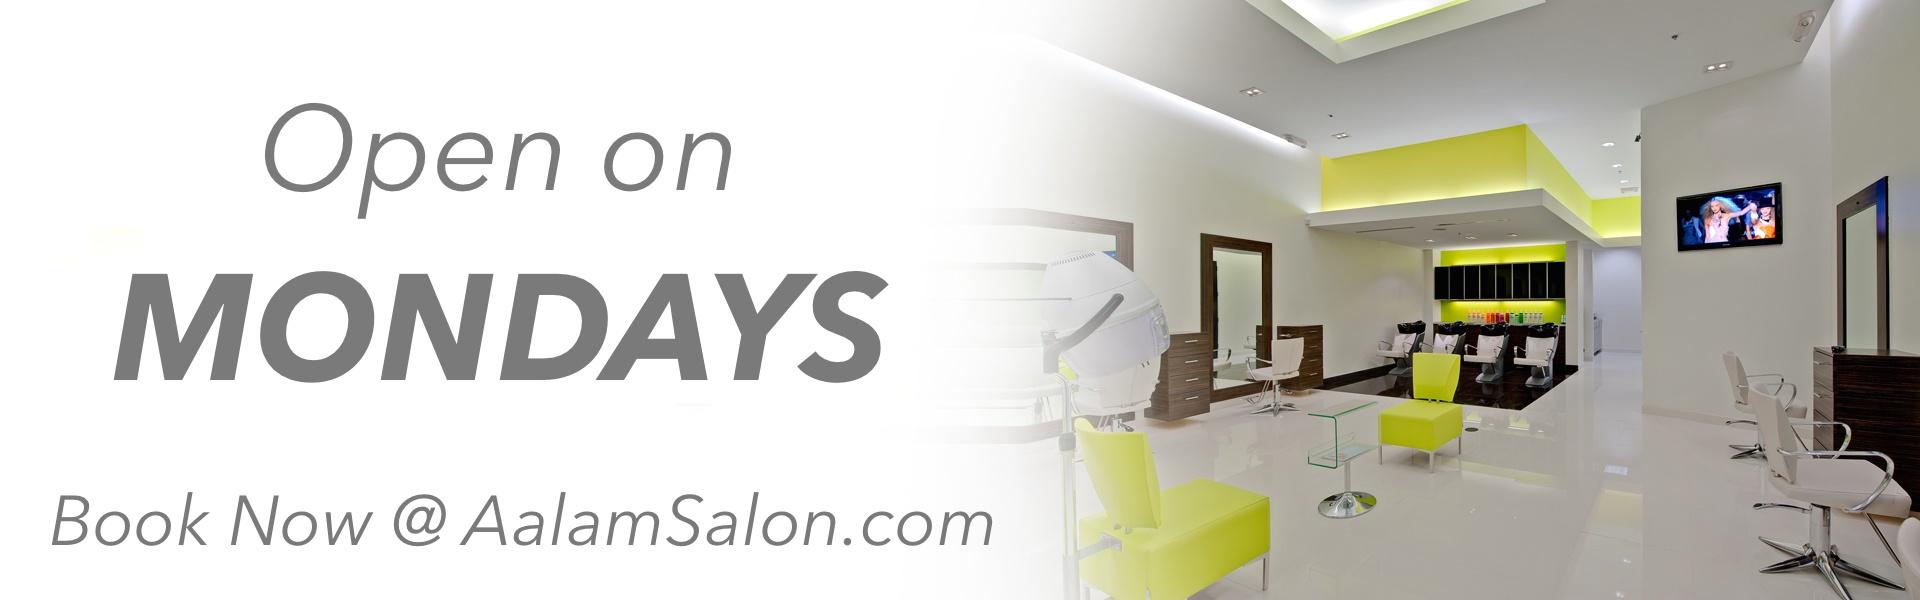 Hair Salon Open on Monday in Plano Frisco Dallas Allen McKinney Addison TX DFW AALAM The Salon For Men women Upscale High End Hair salon open on Mondays Haircut Color